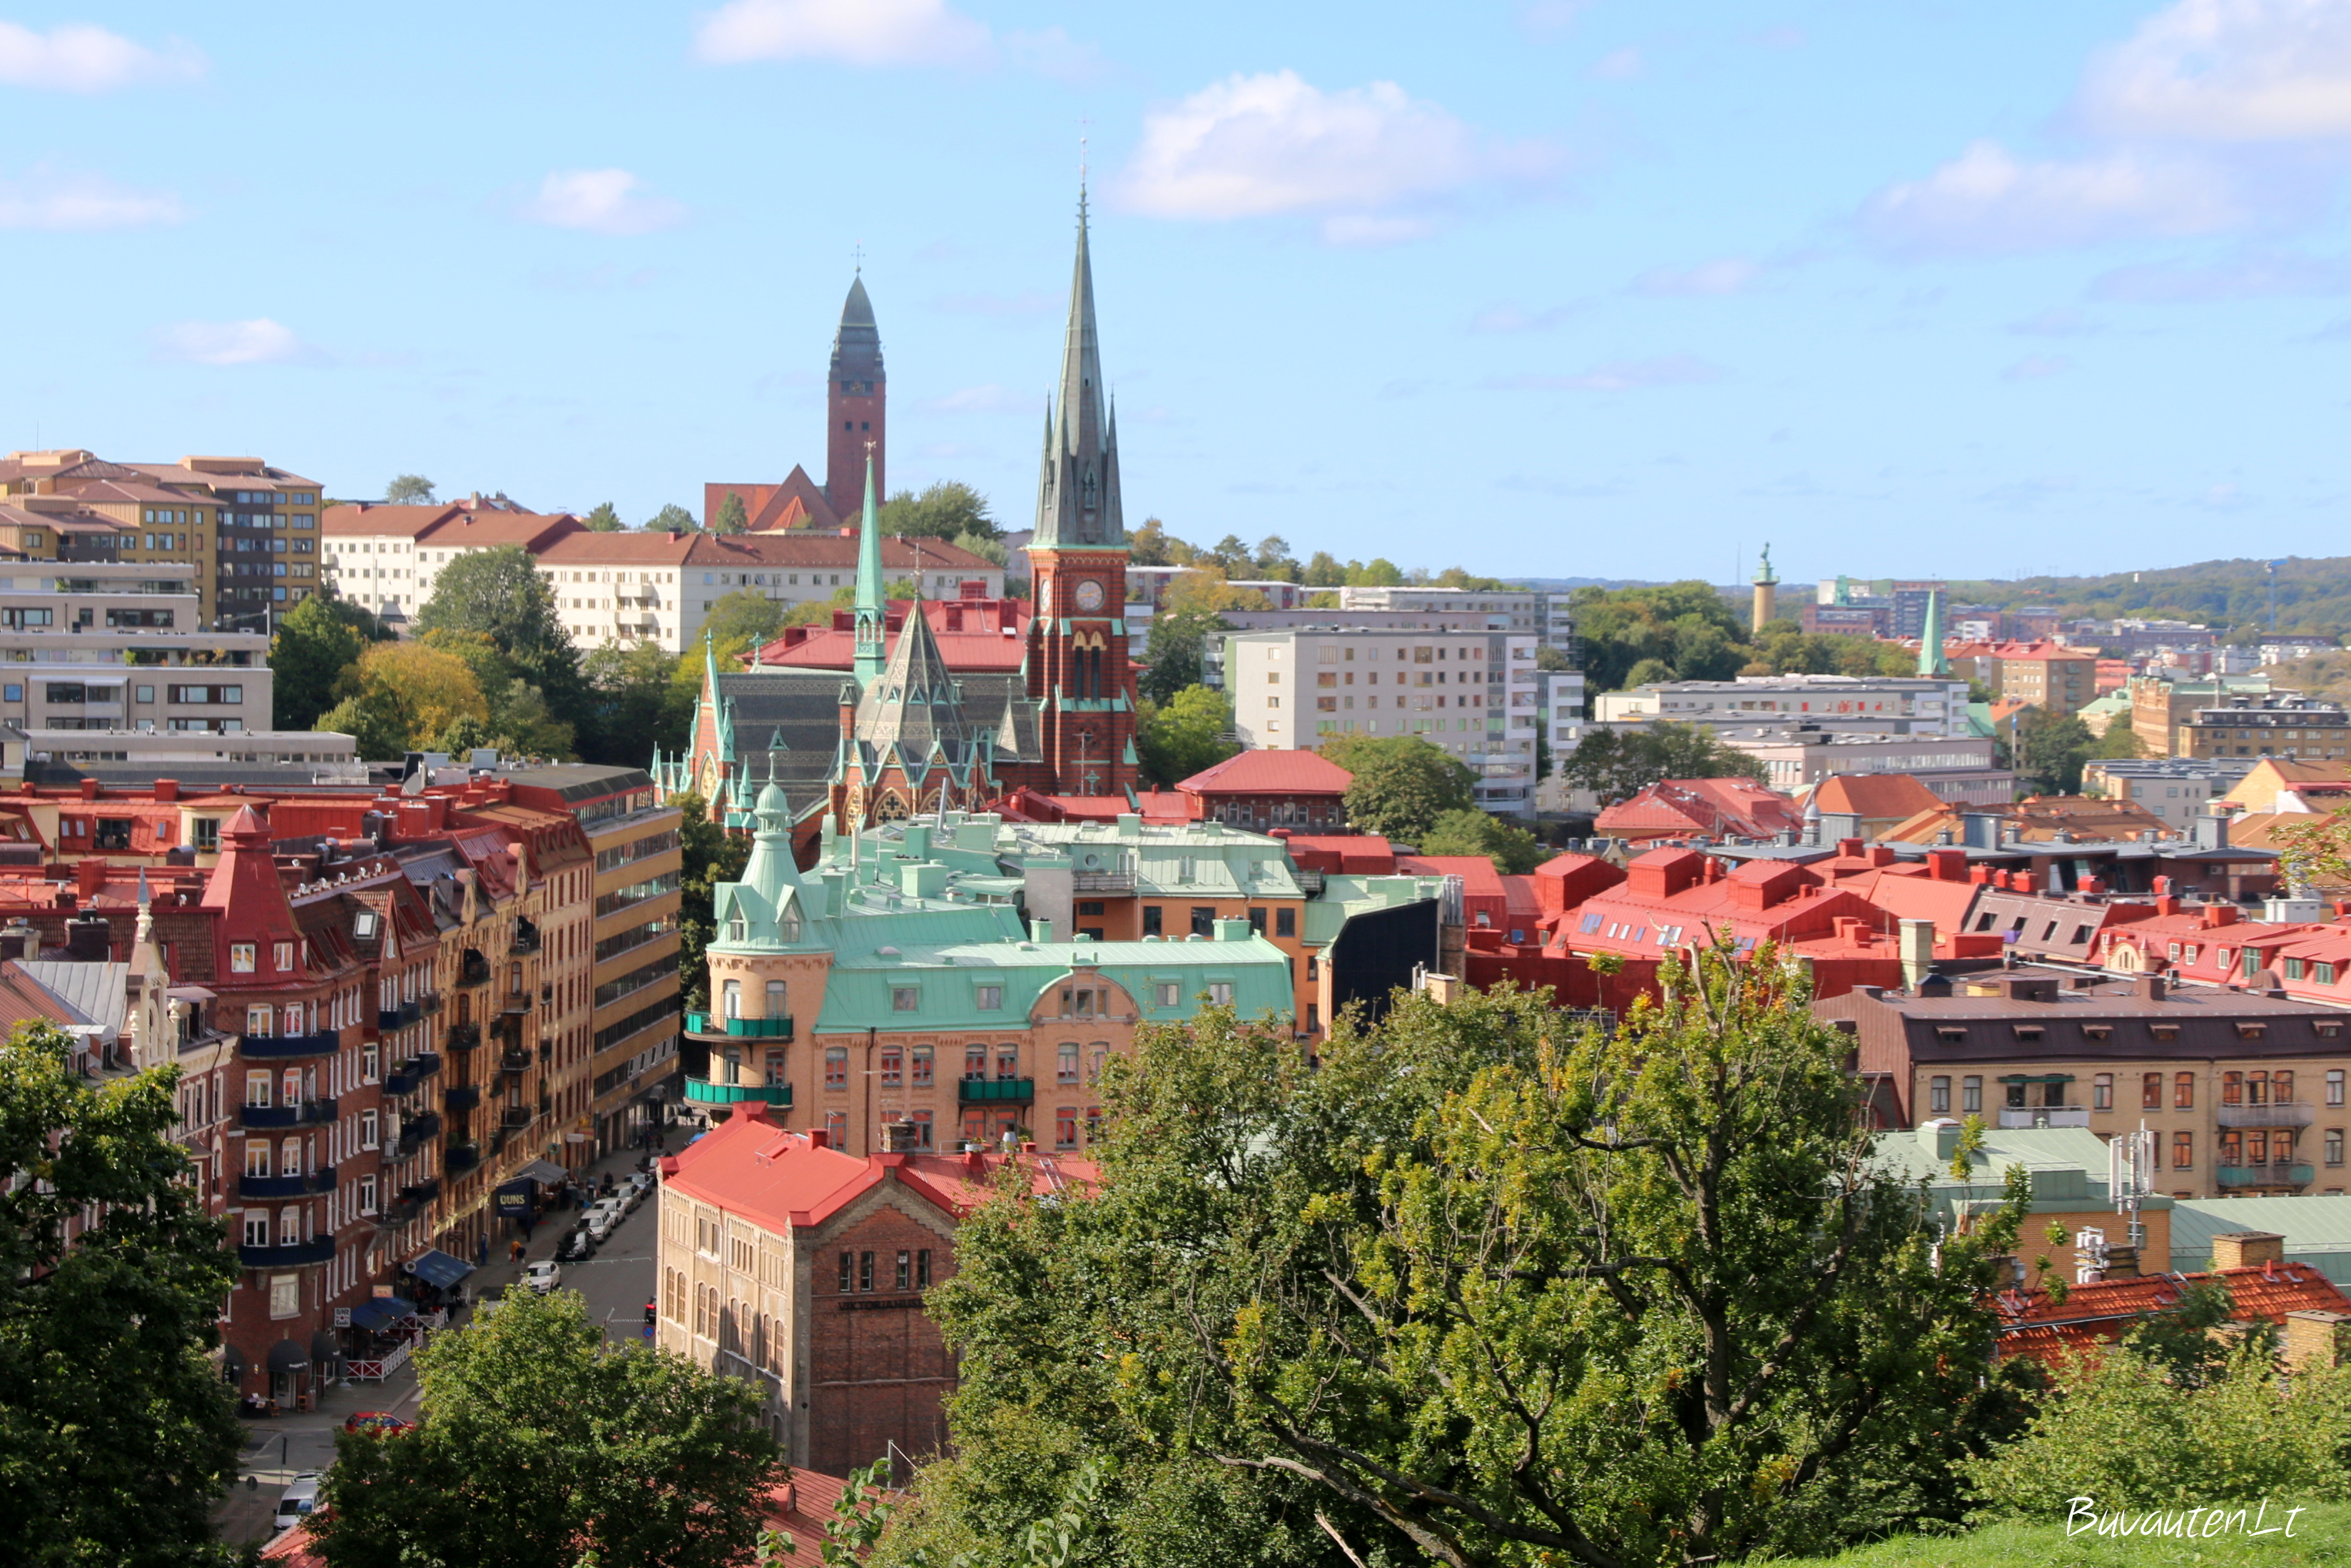 Geteborgo stogai nuo Skansen Kronan